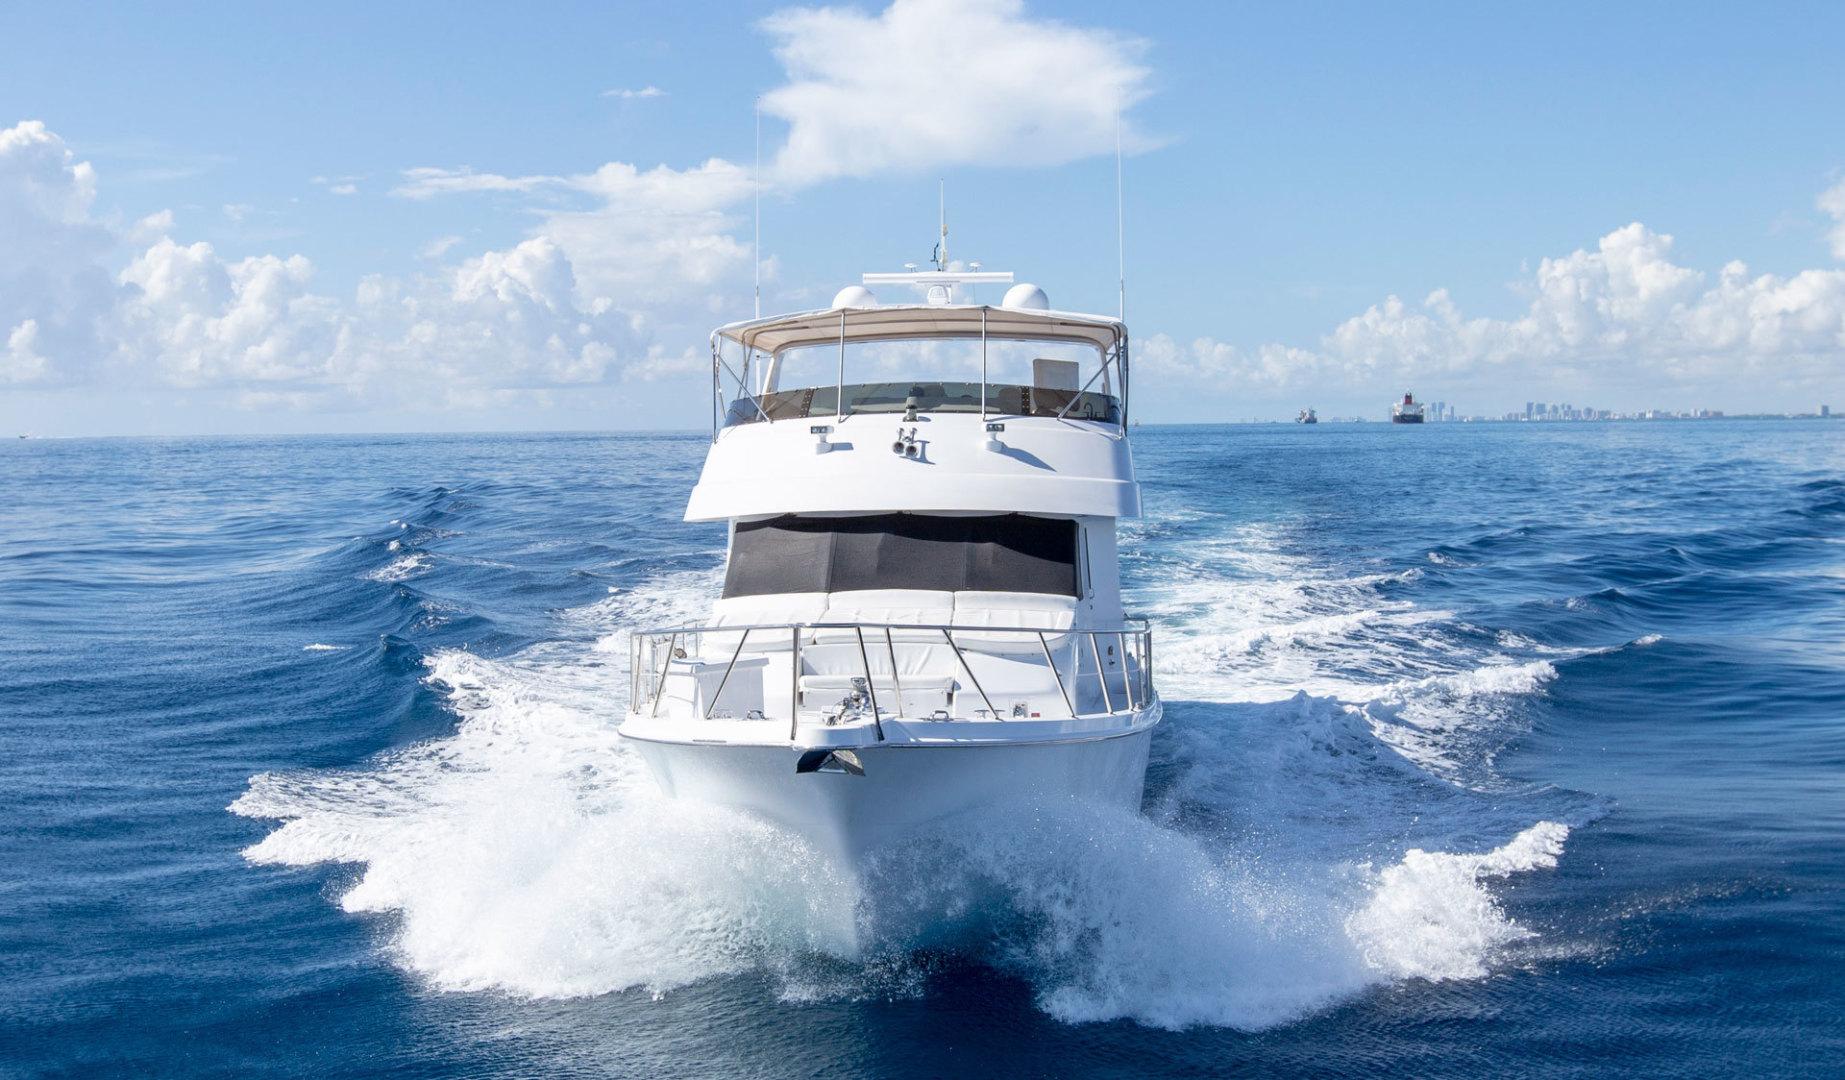 Hatteras-Cockpit Motor Yacht 2000-Getaway Ft. Lauderdale-Florida-United States-1417499 | Thumbnail